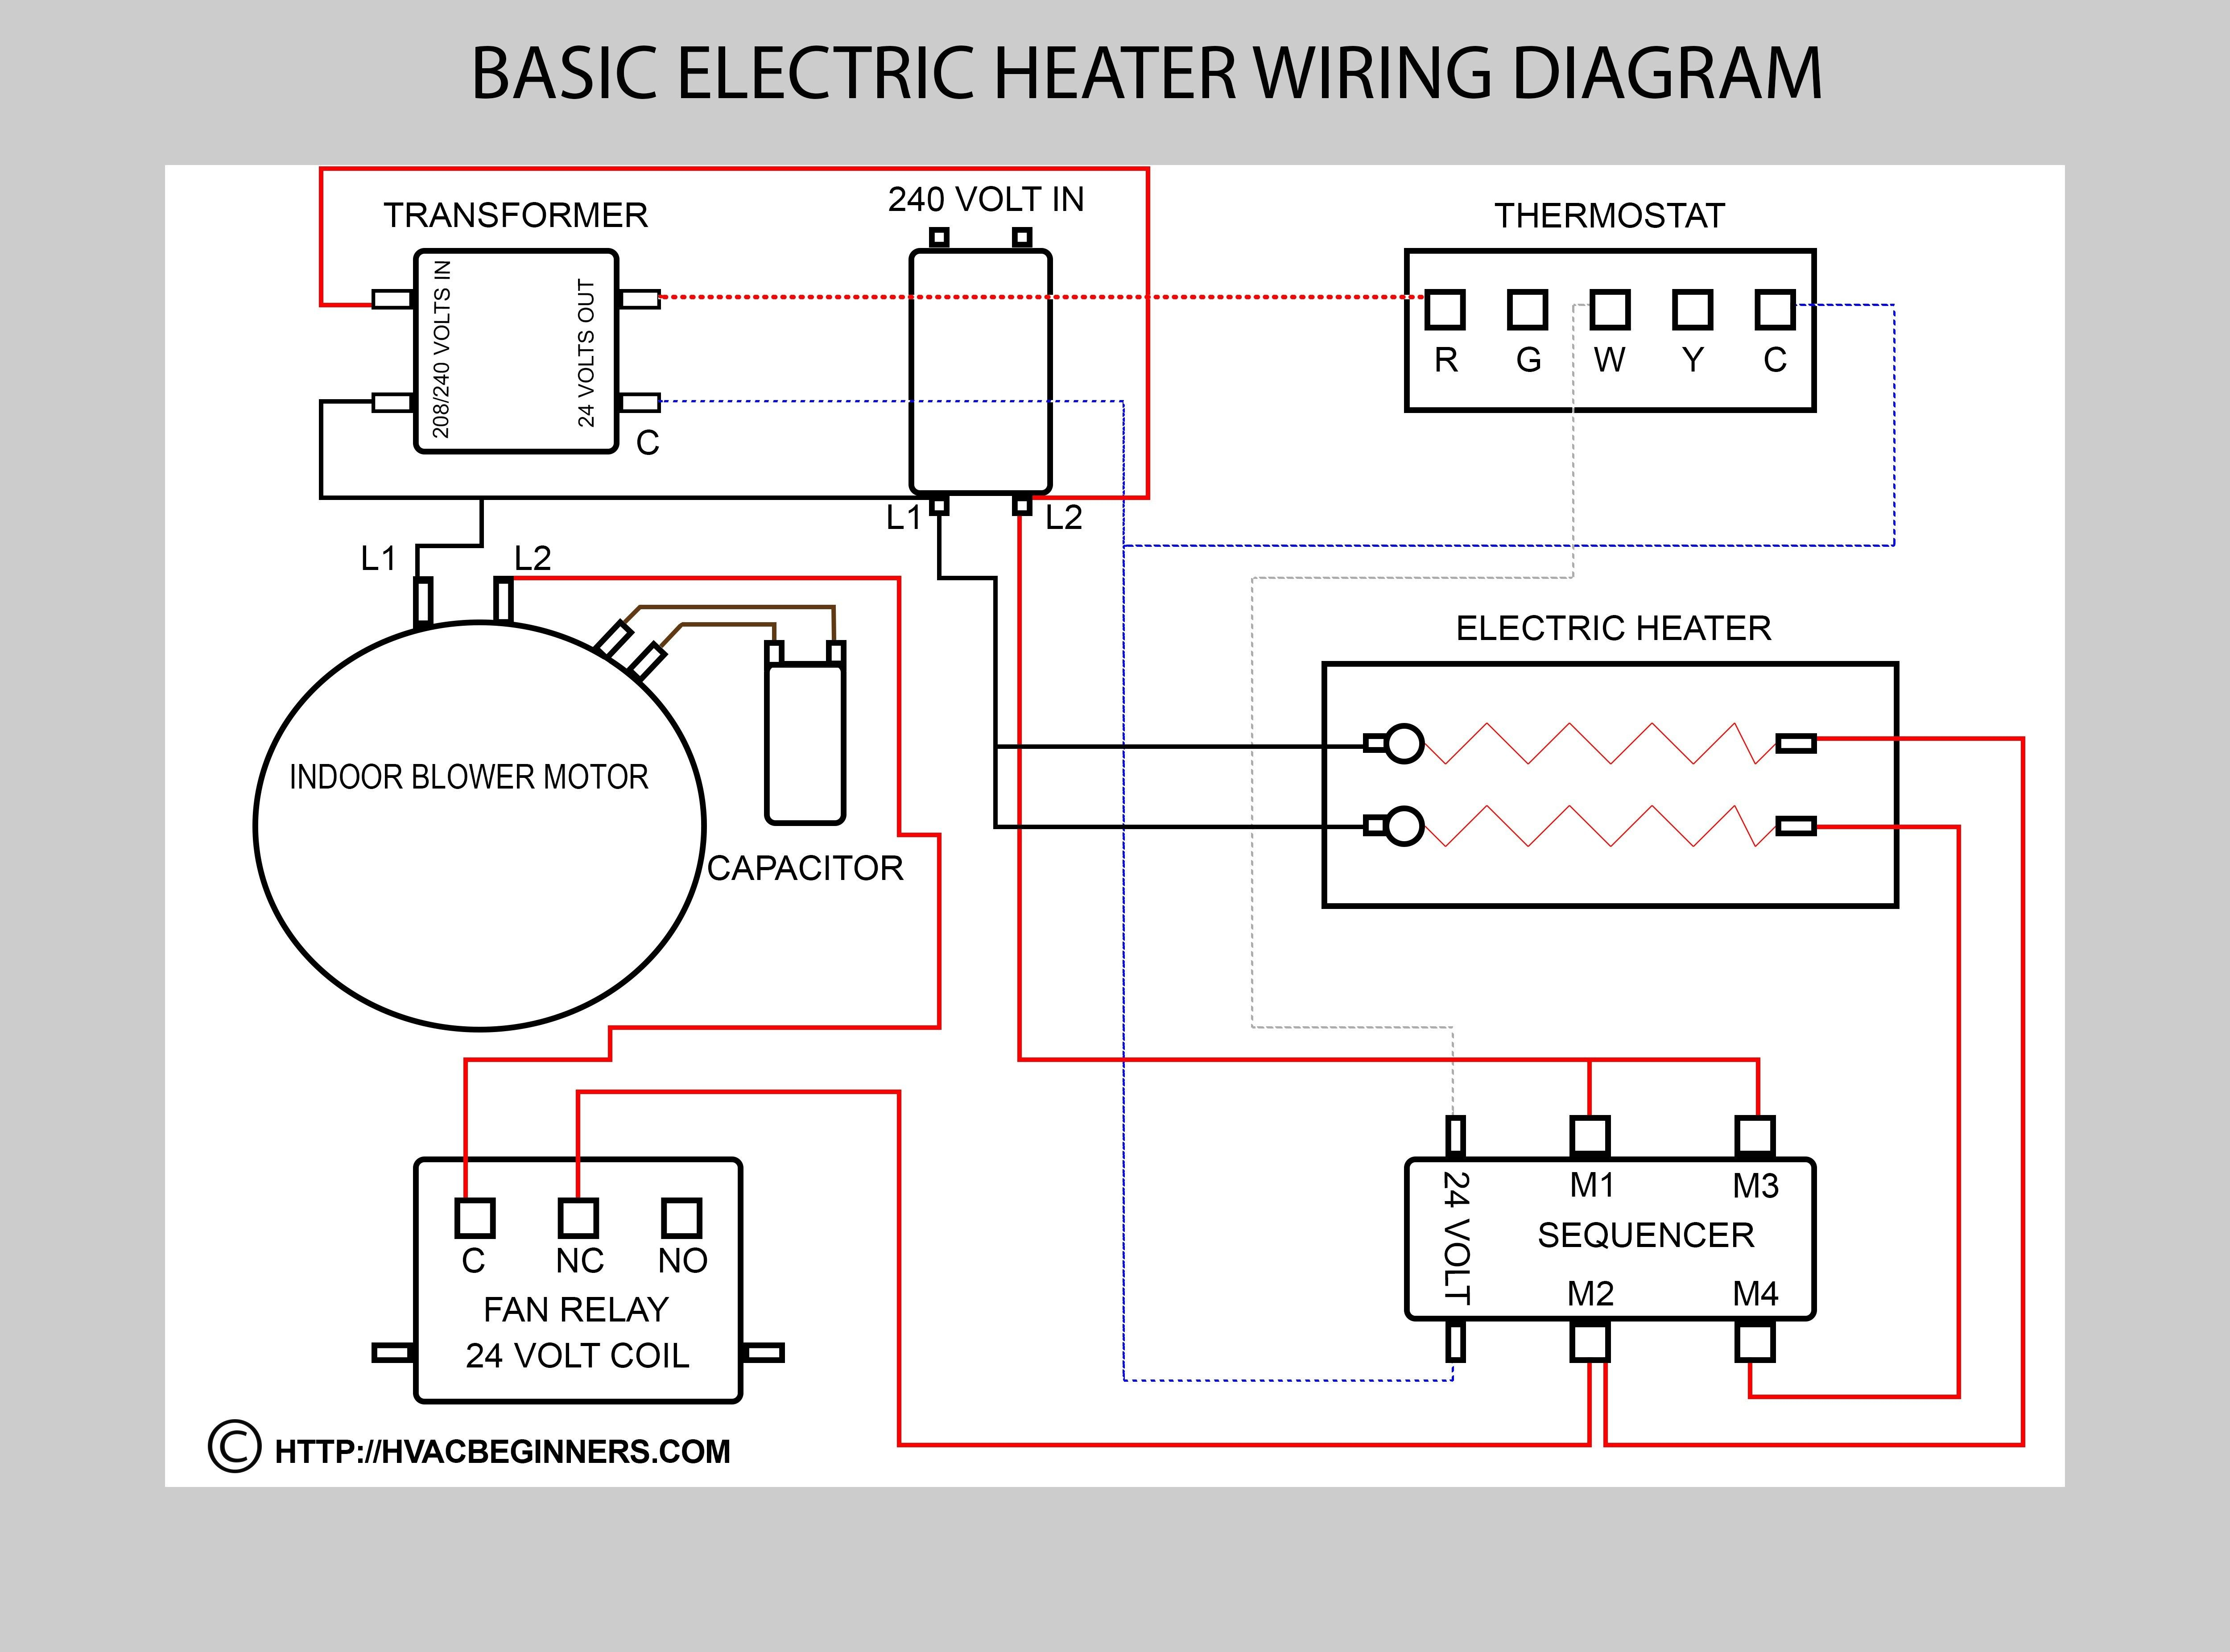 Car Wash Wiring Diagram | Wiring Diagrams Old Car Wash Wiring Diagrams on